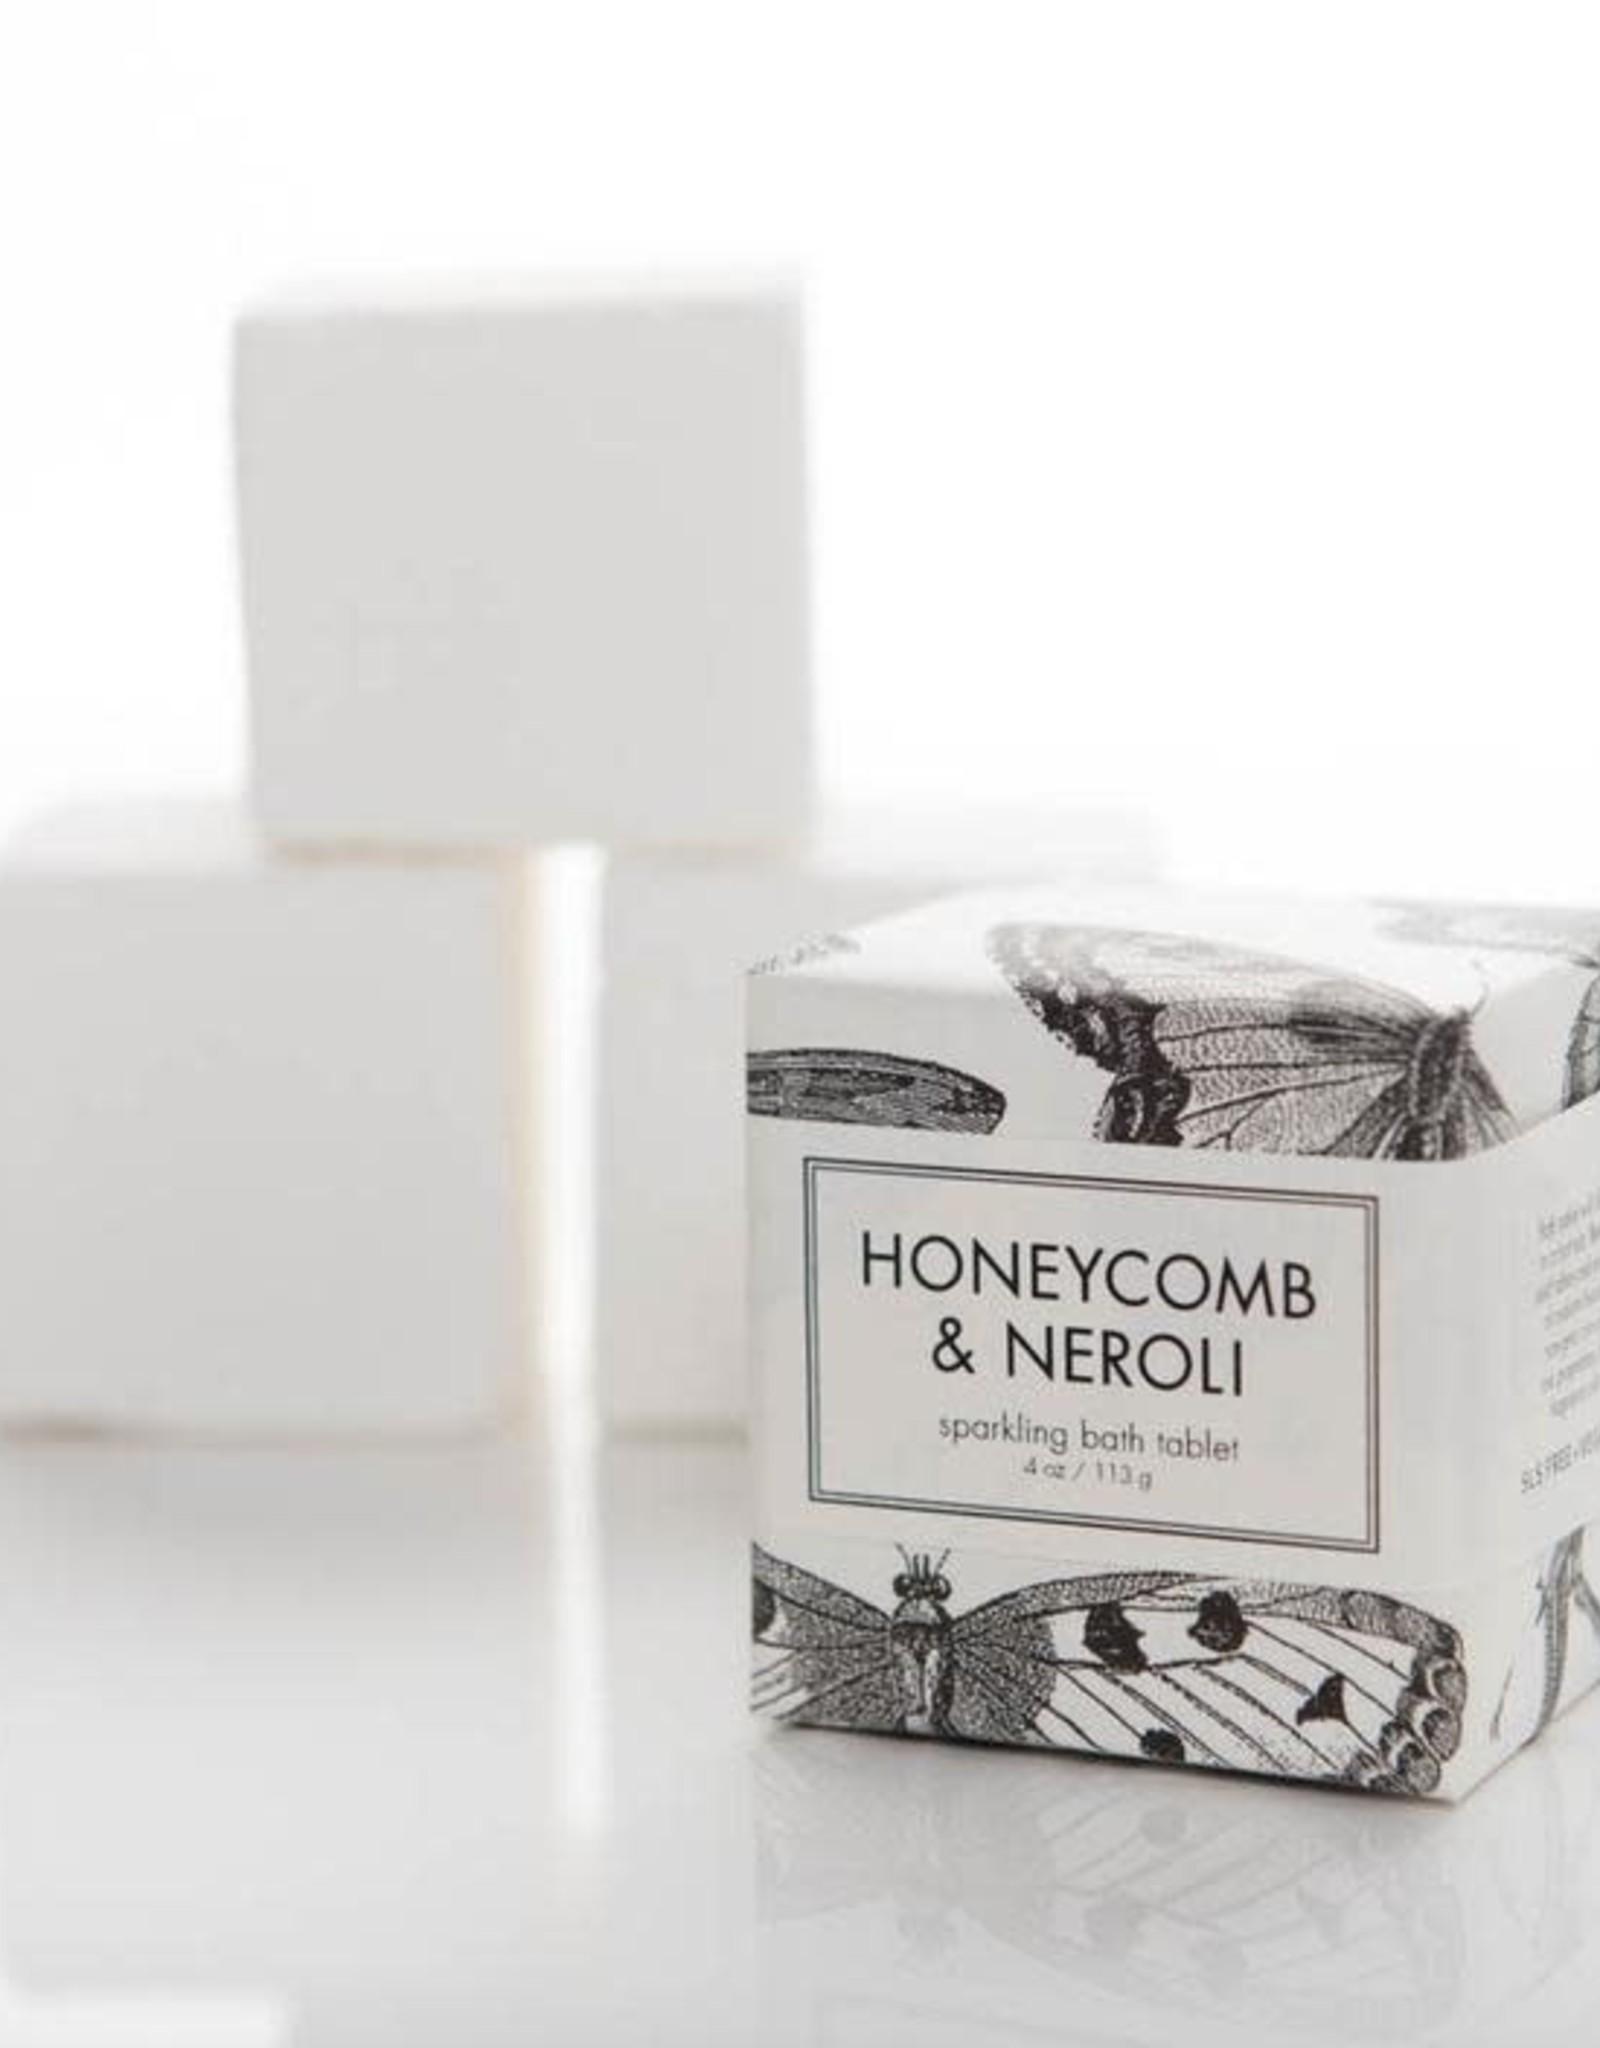 Formulary 55 Honeycomb & Neroli Bath Tablet